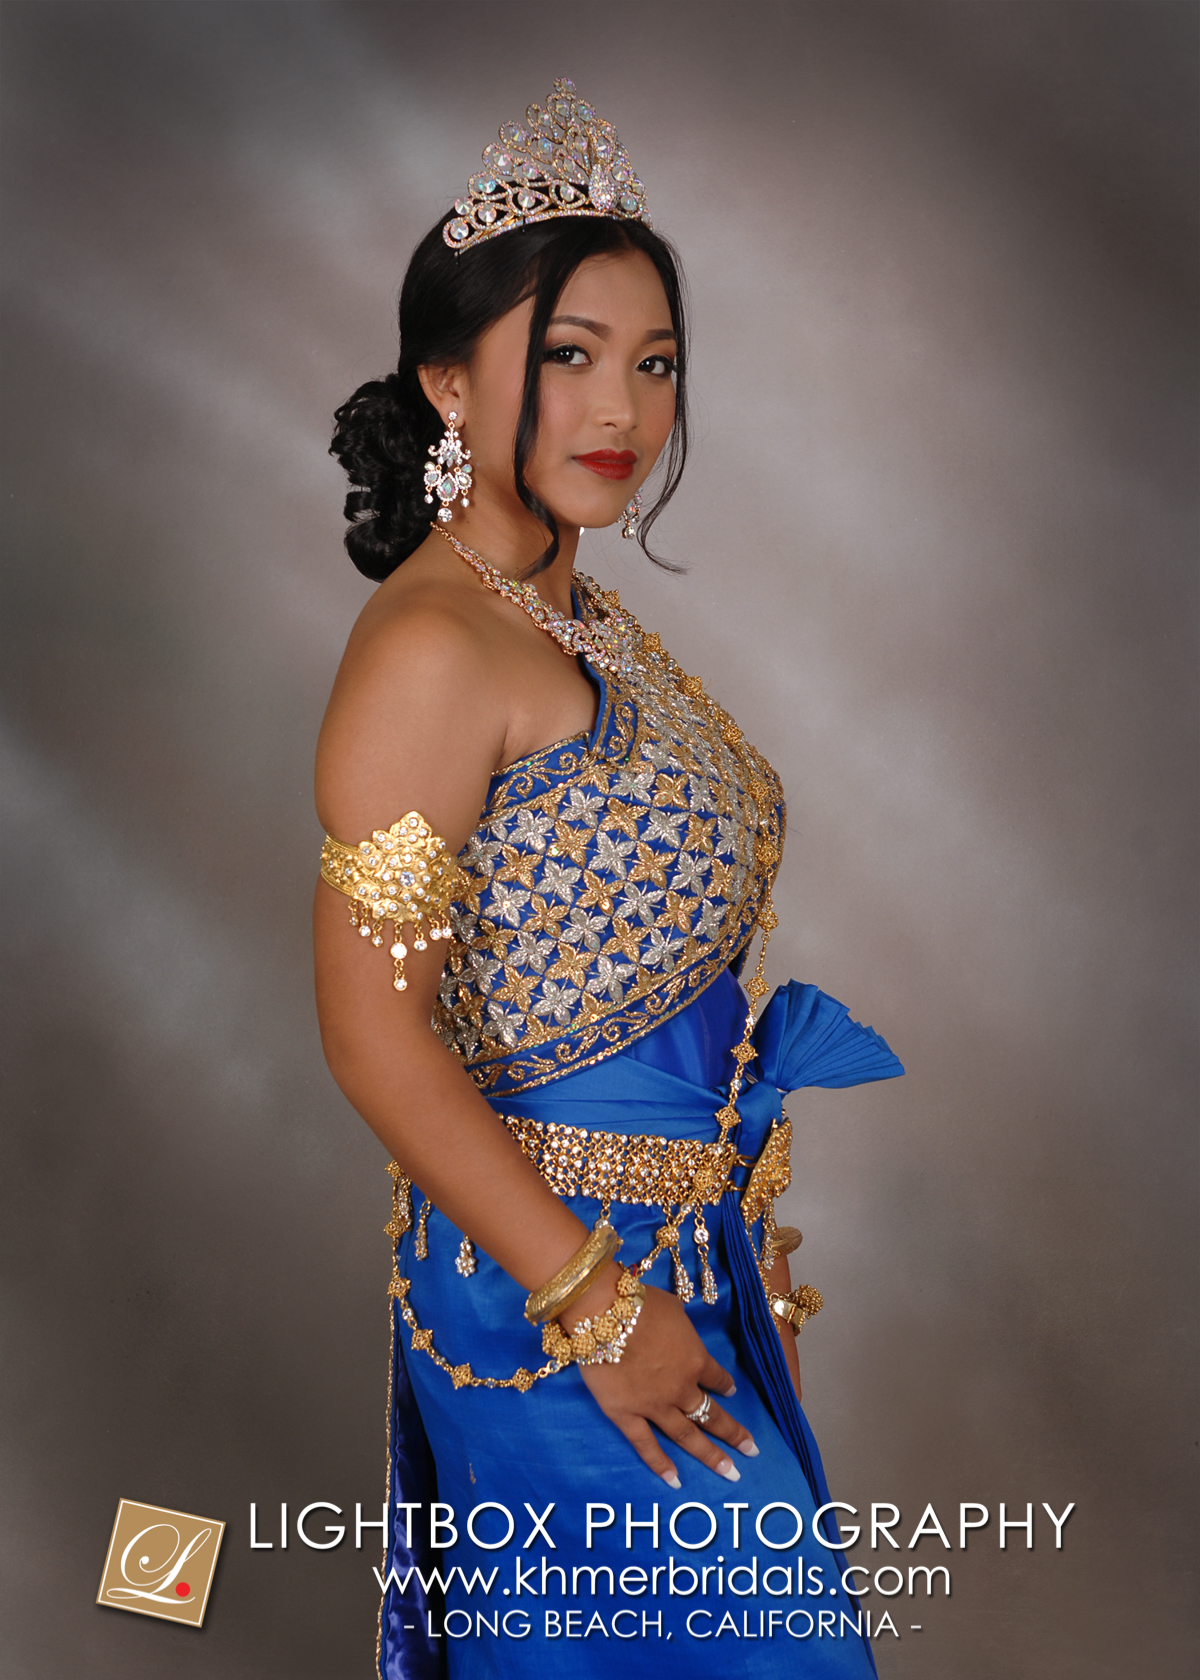 Apsara Khmer Bridal Wedding Photography and video-207.jpg